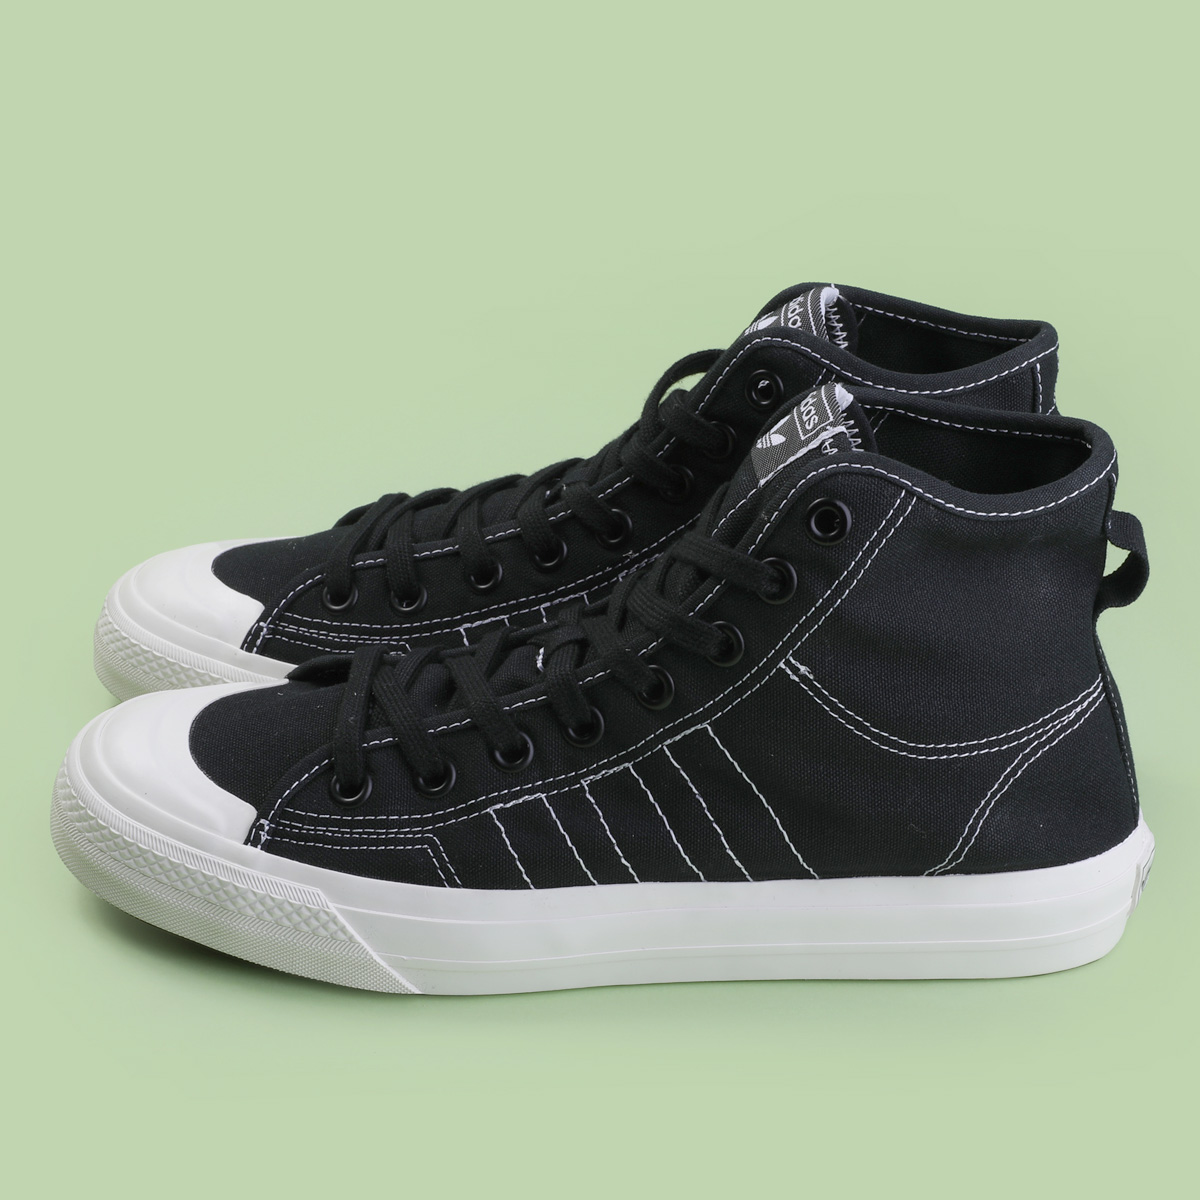 adidas Nizza Hi RF shoes black